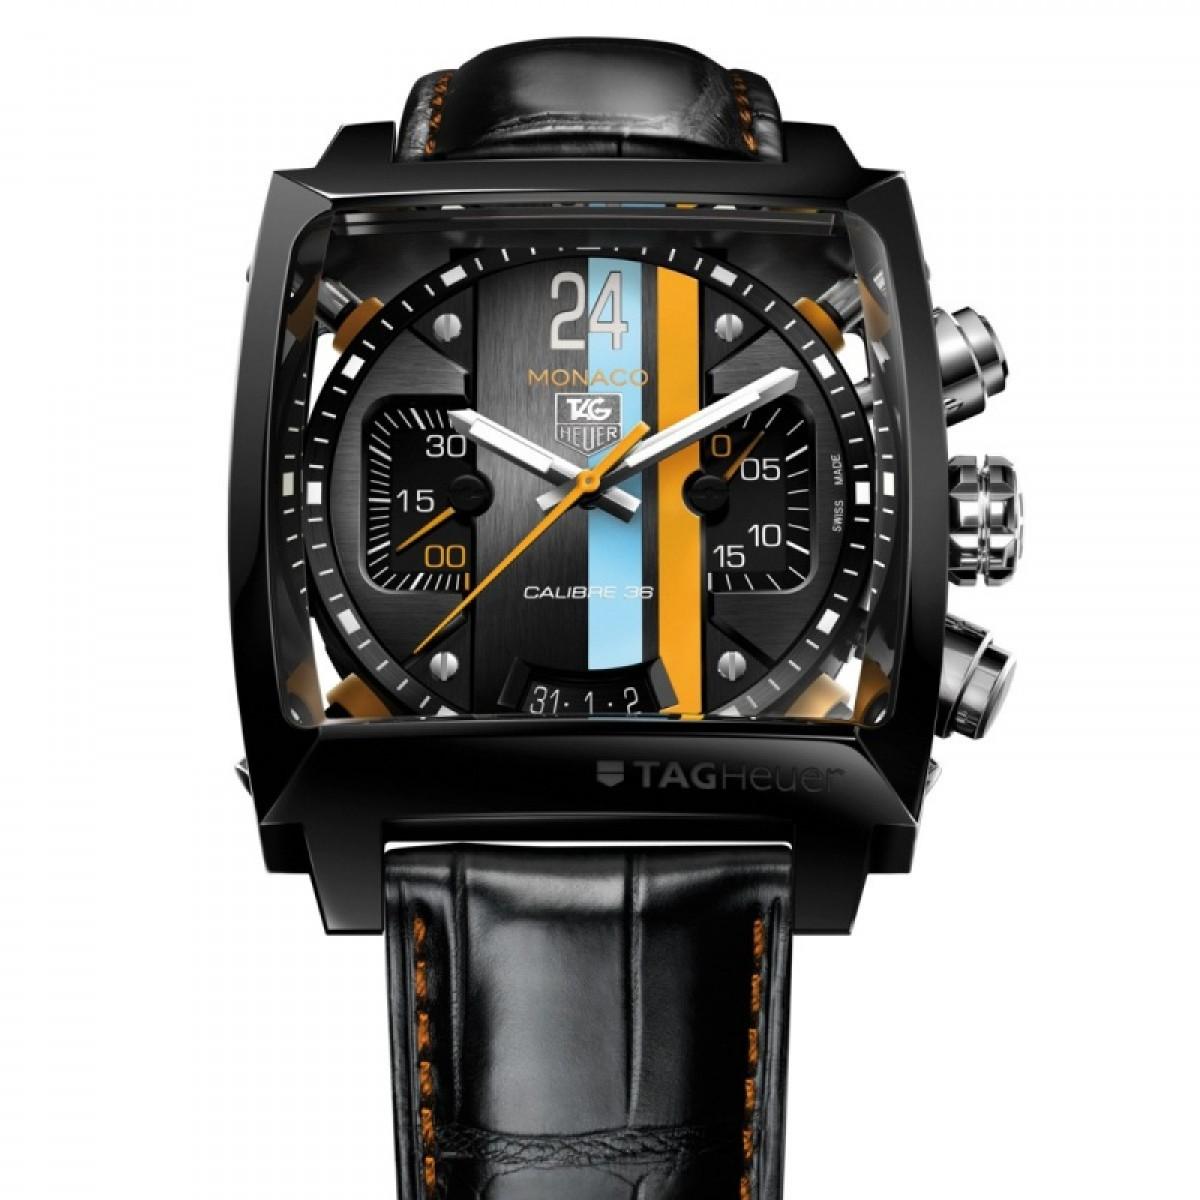 2d8adbabeb1 Relógio Réplica Tag Heuer Monaco 24 Concept Chronograph